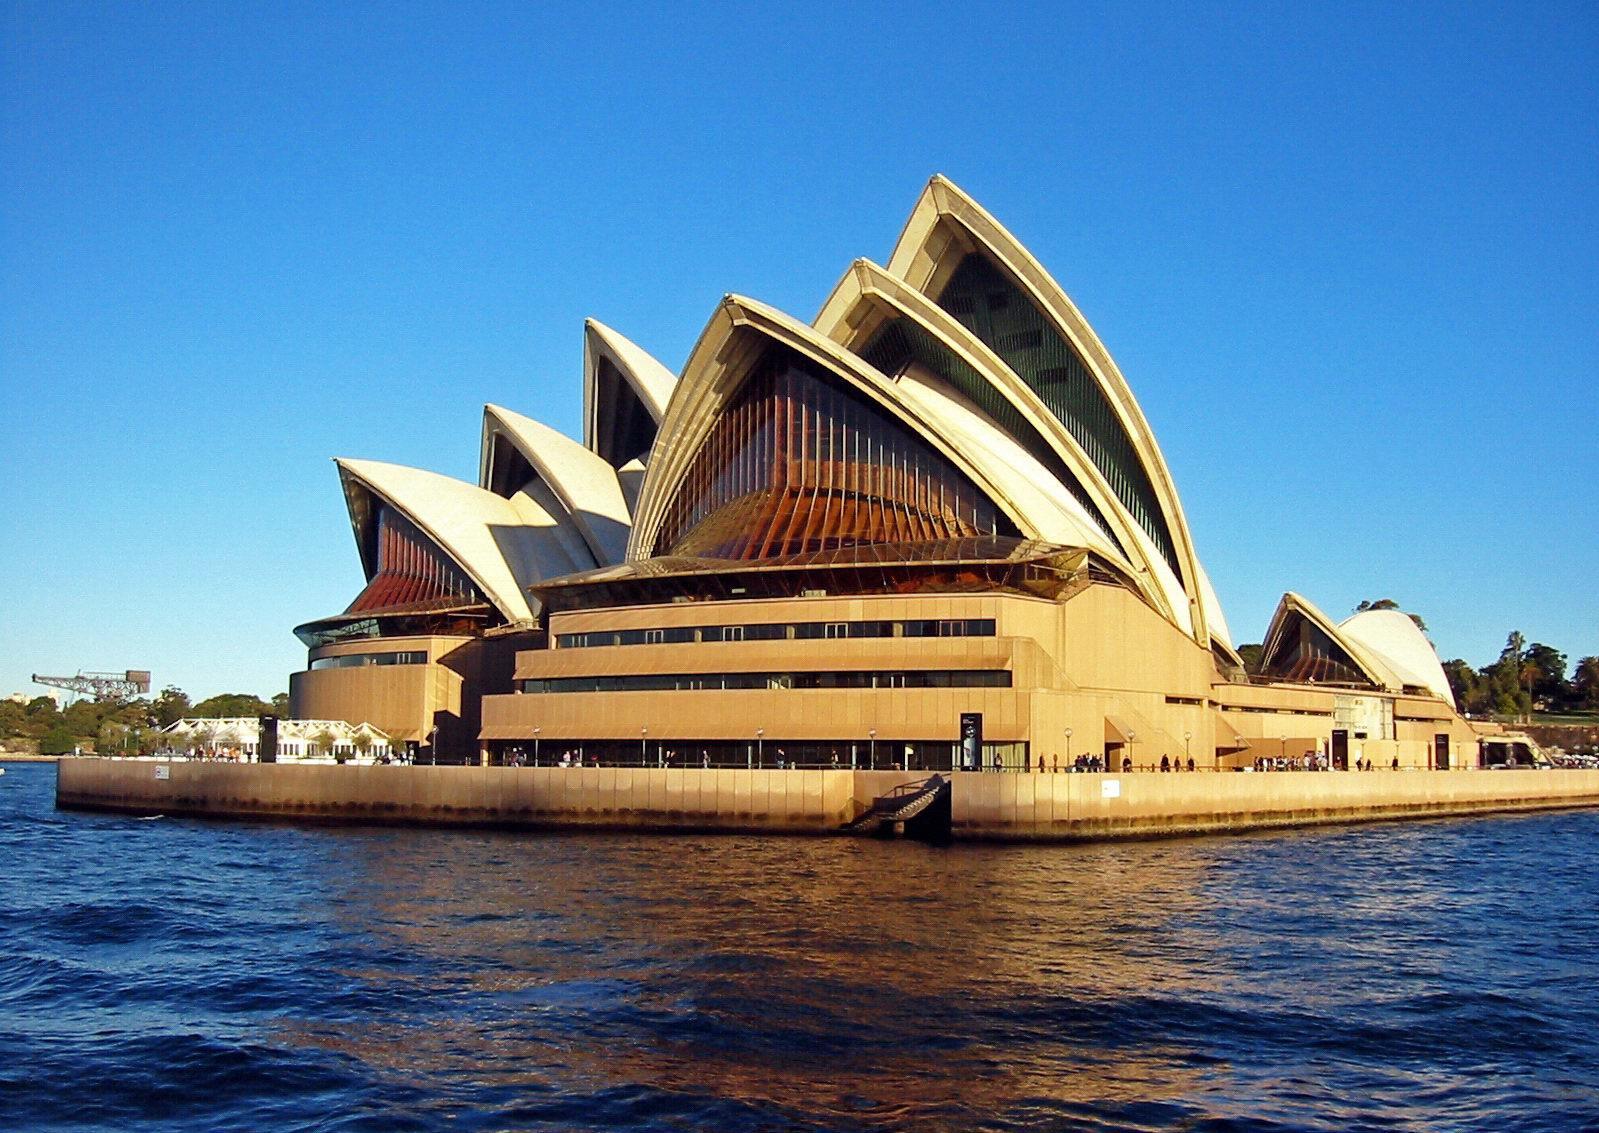 sydney opera house australia wallpapers - Sydney Opera House Australia HD desktop wallpaper